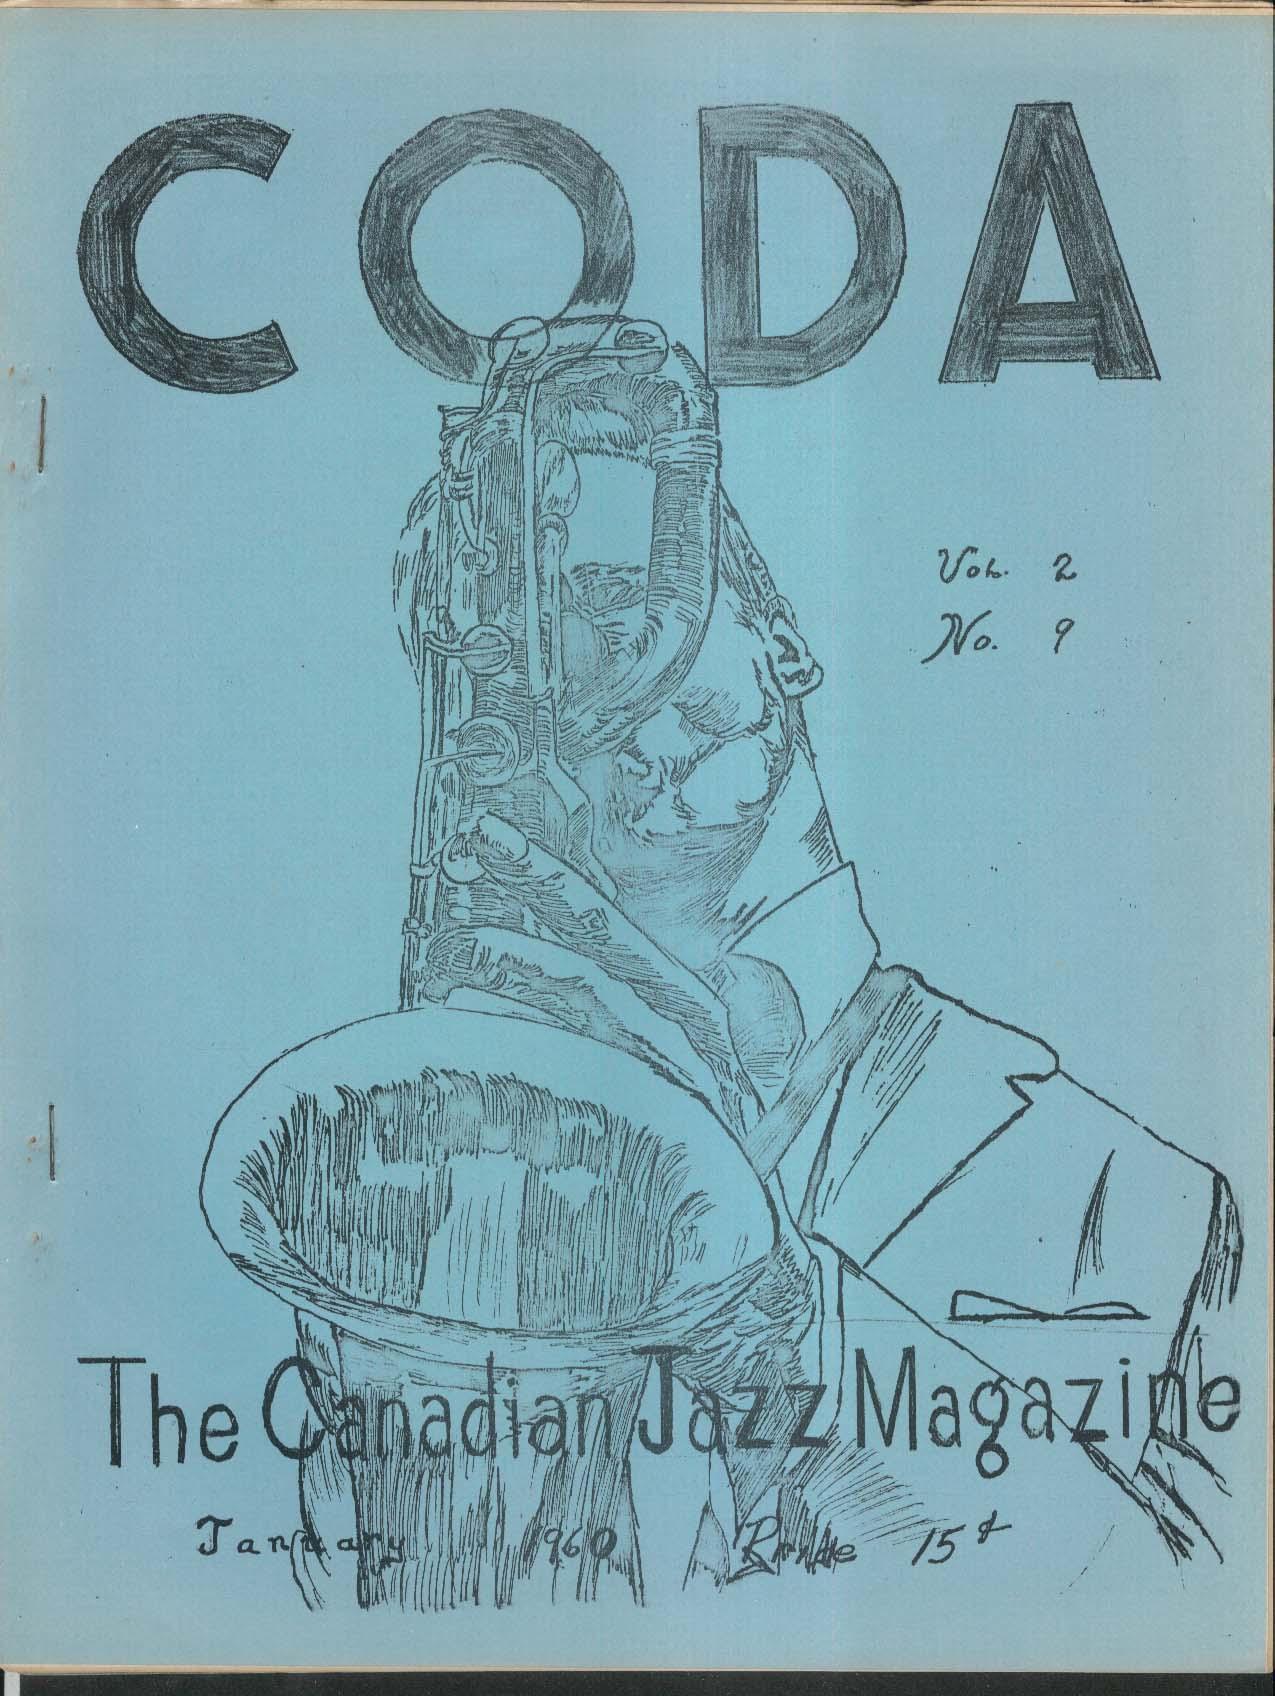 CODA V2 #9 Canadian Jazz Magazine 1 1960